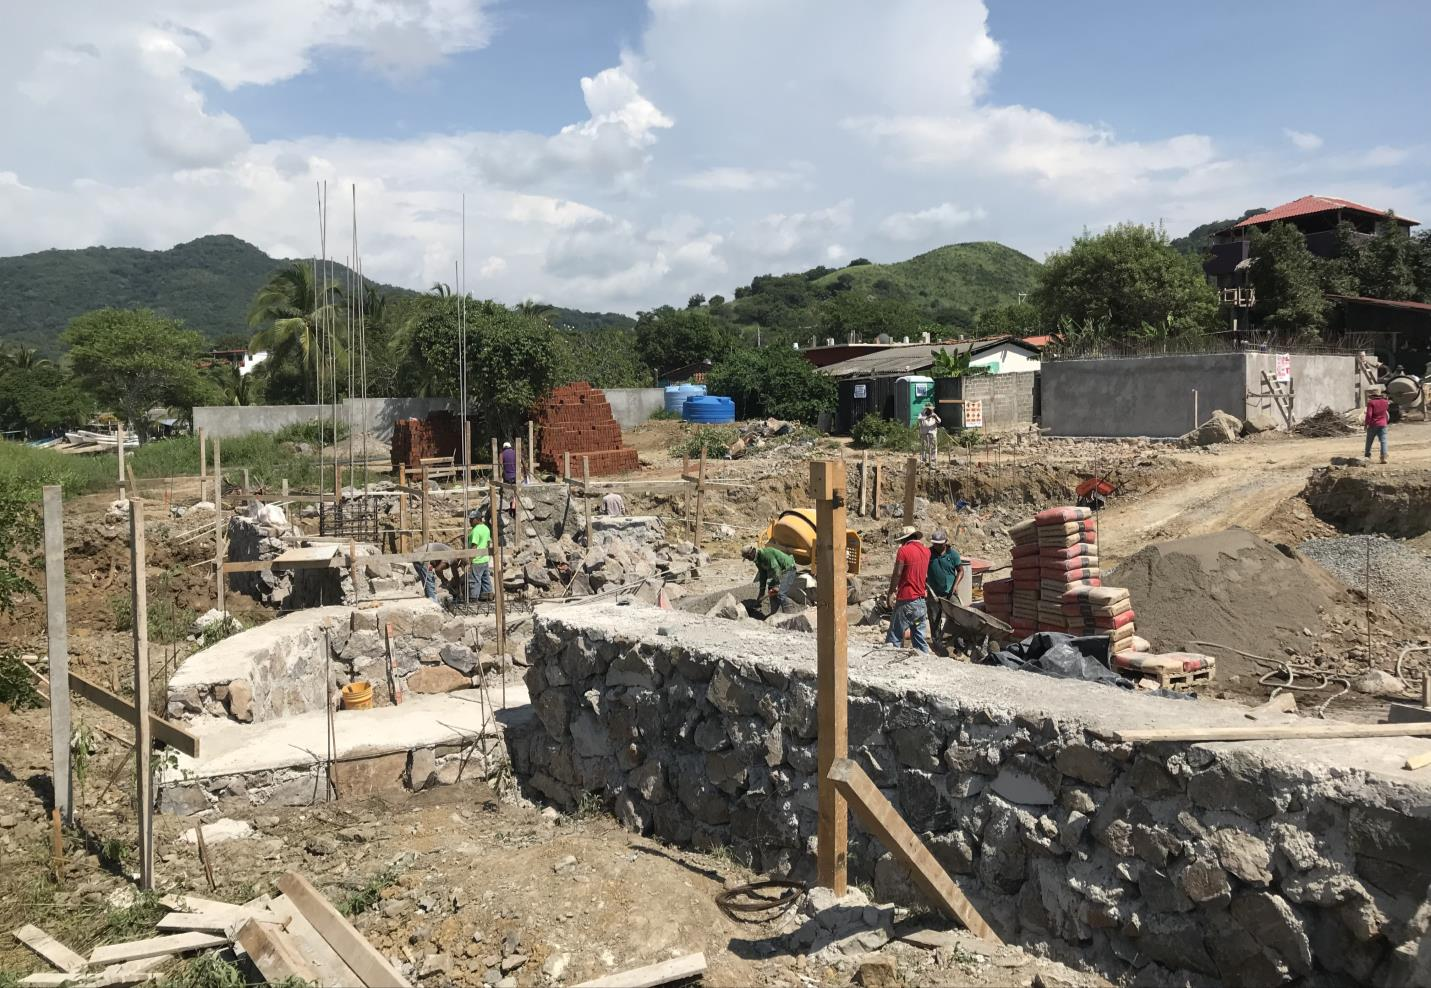 REPORTE-FOTOGRAFICO-PUNTA-MAJAHUA-29-SEPTIEMBRE-DEL-2018-033.jpg